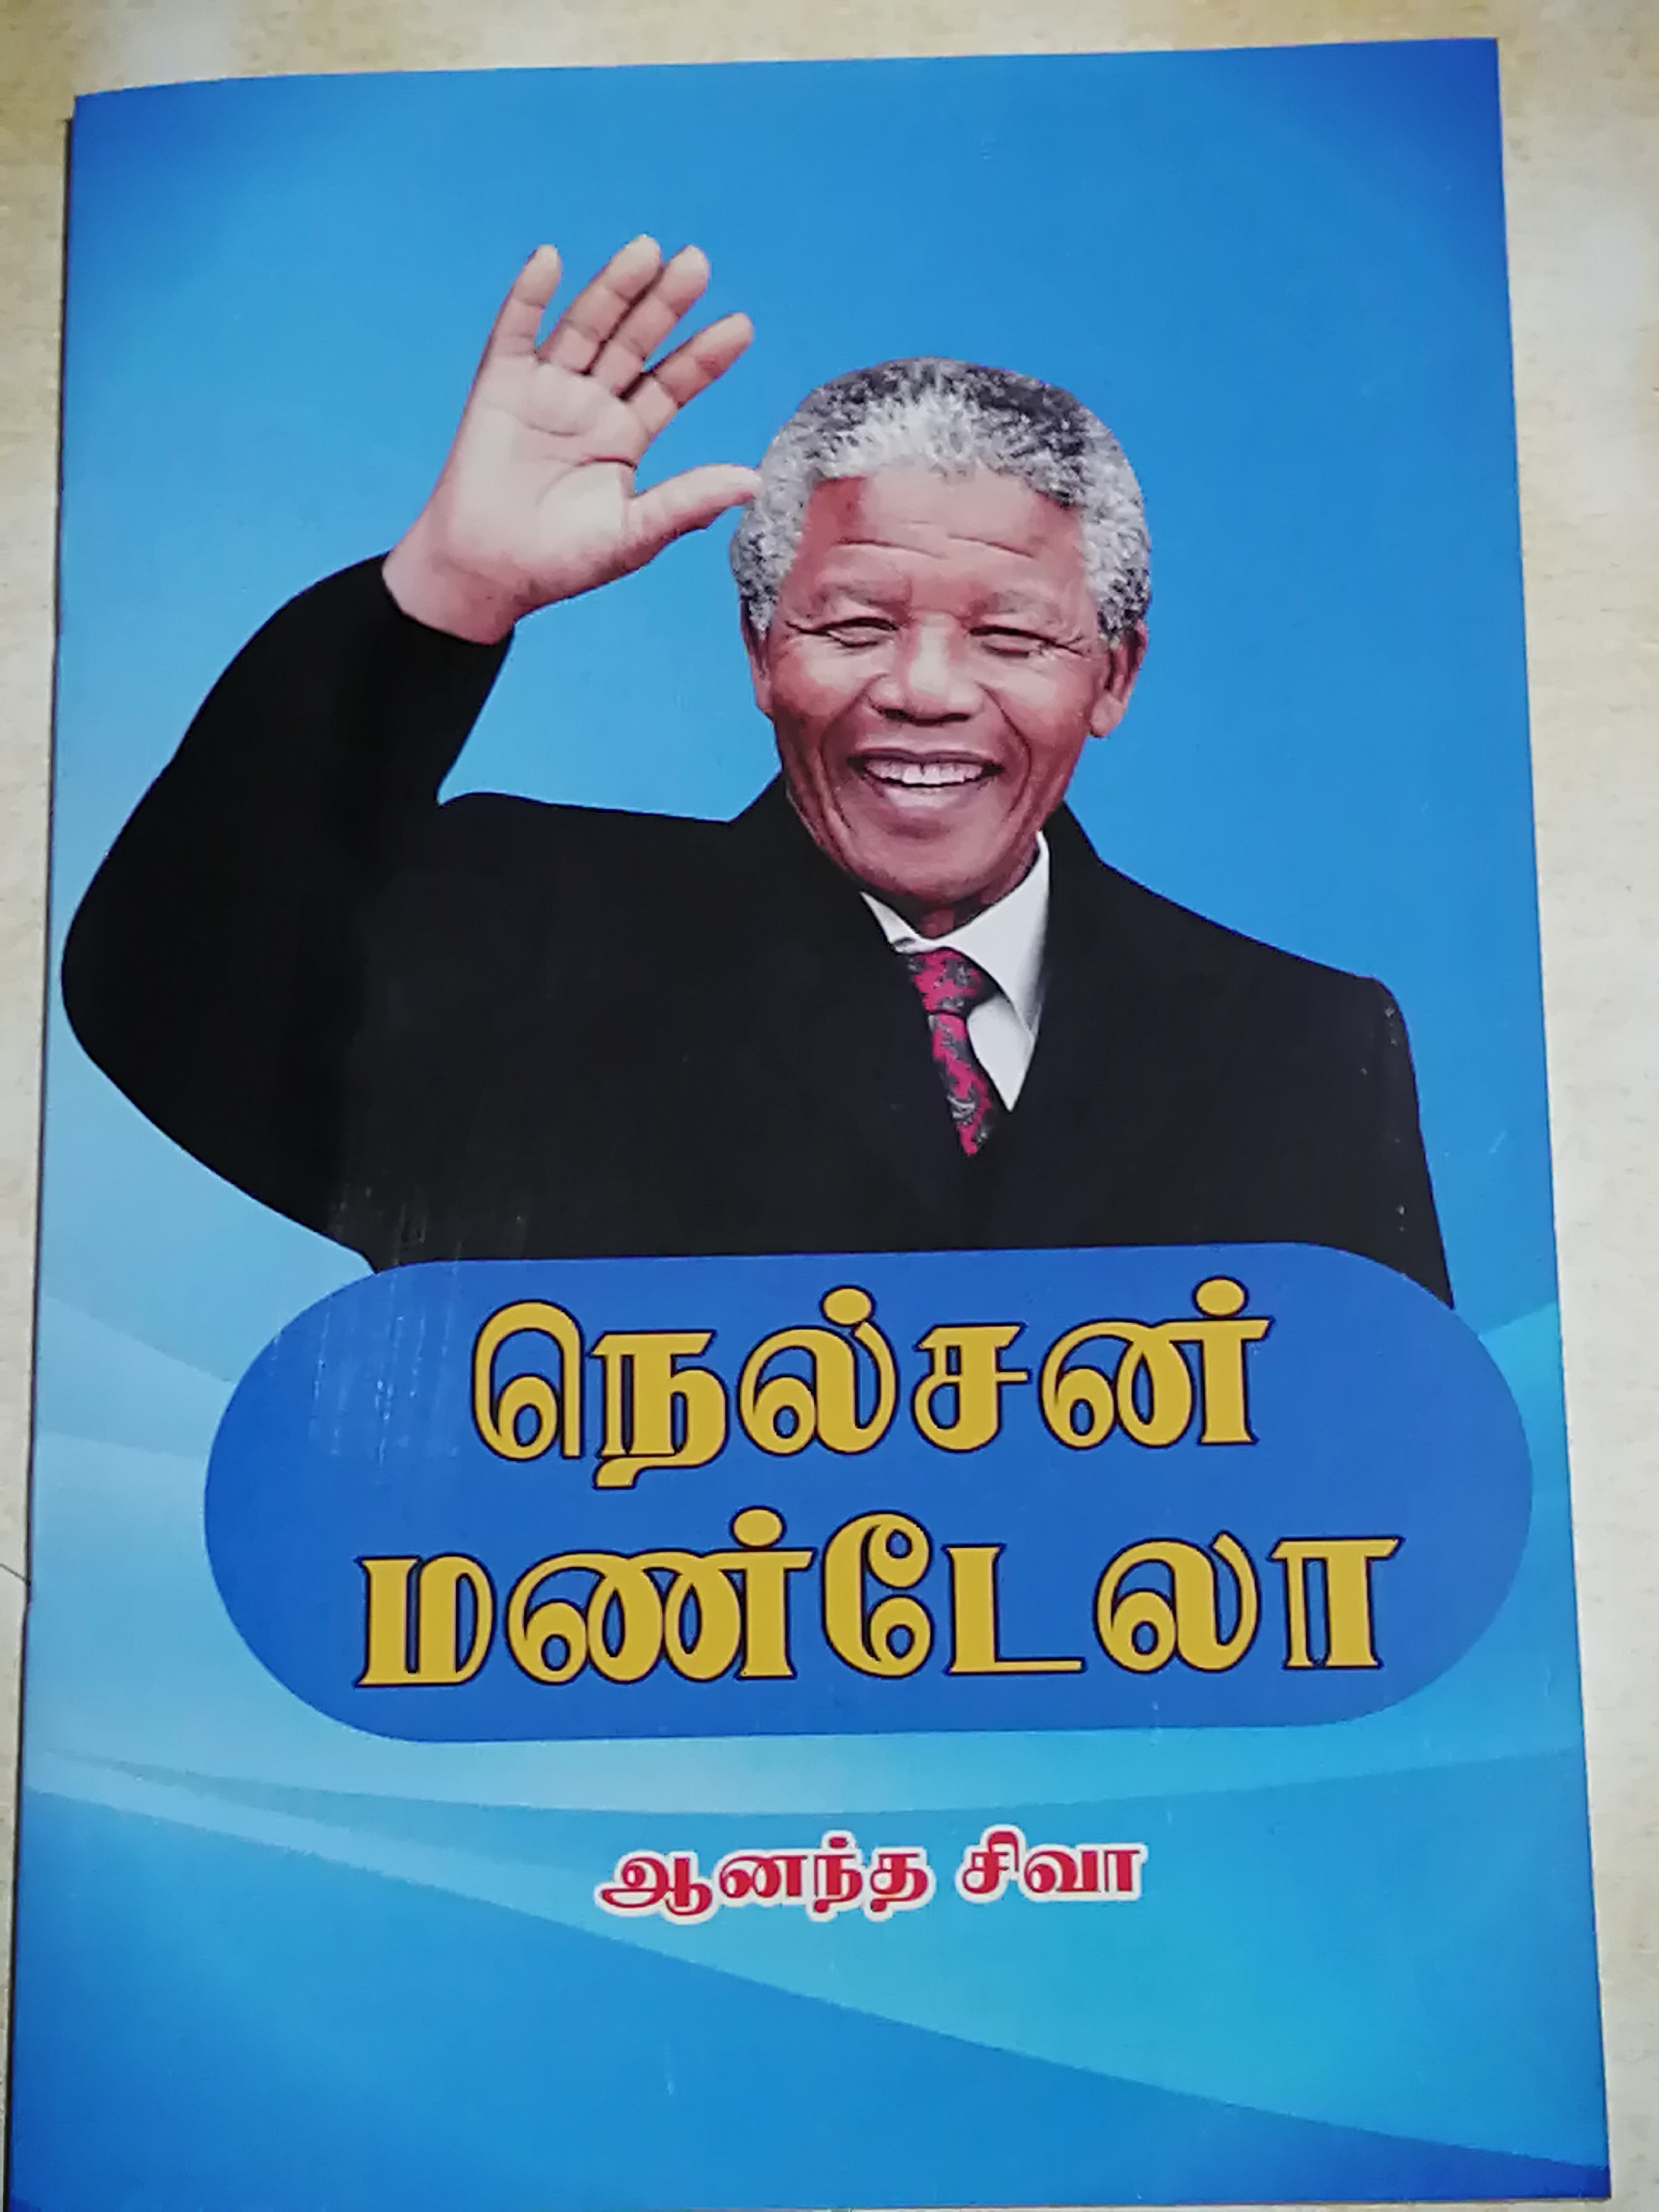 Nelson Mandela by Ananda Siva நெல்சன் மண்டேலா - ஆனந்த சிவா